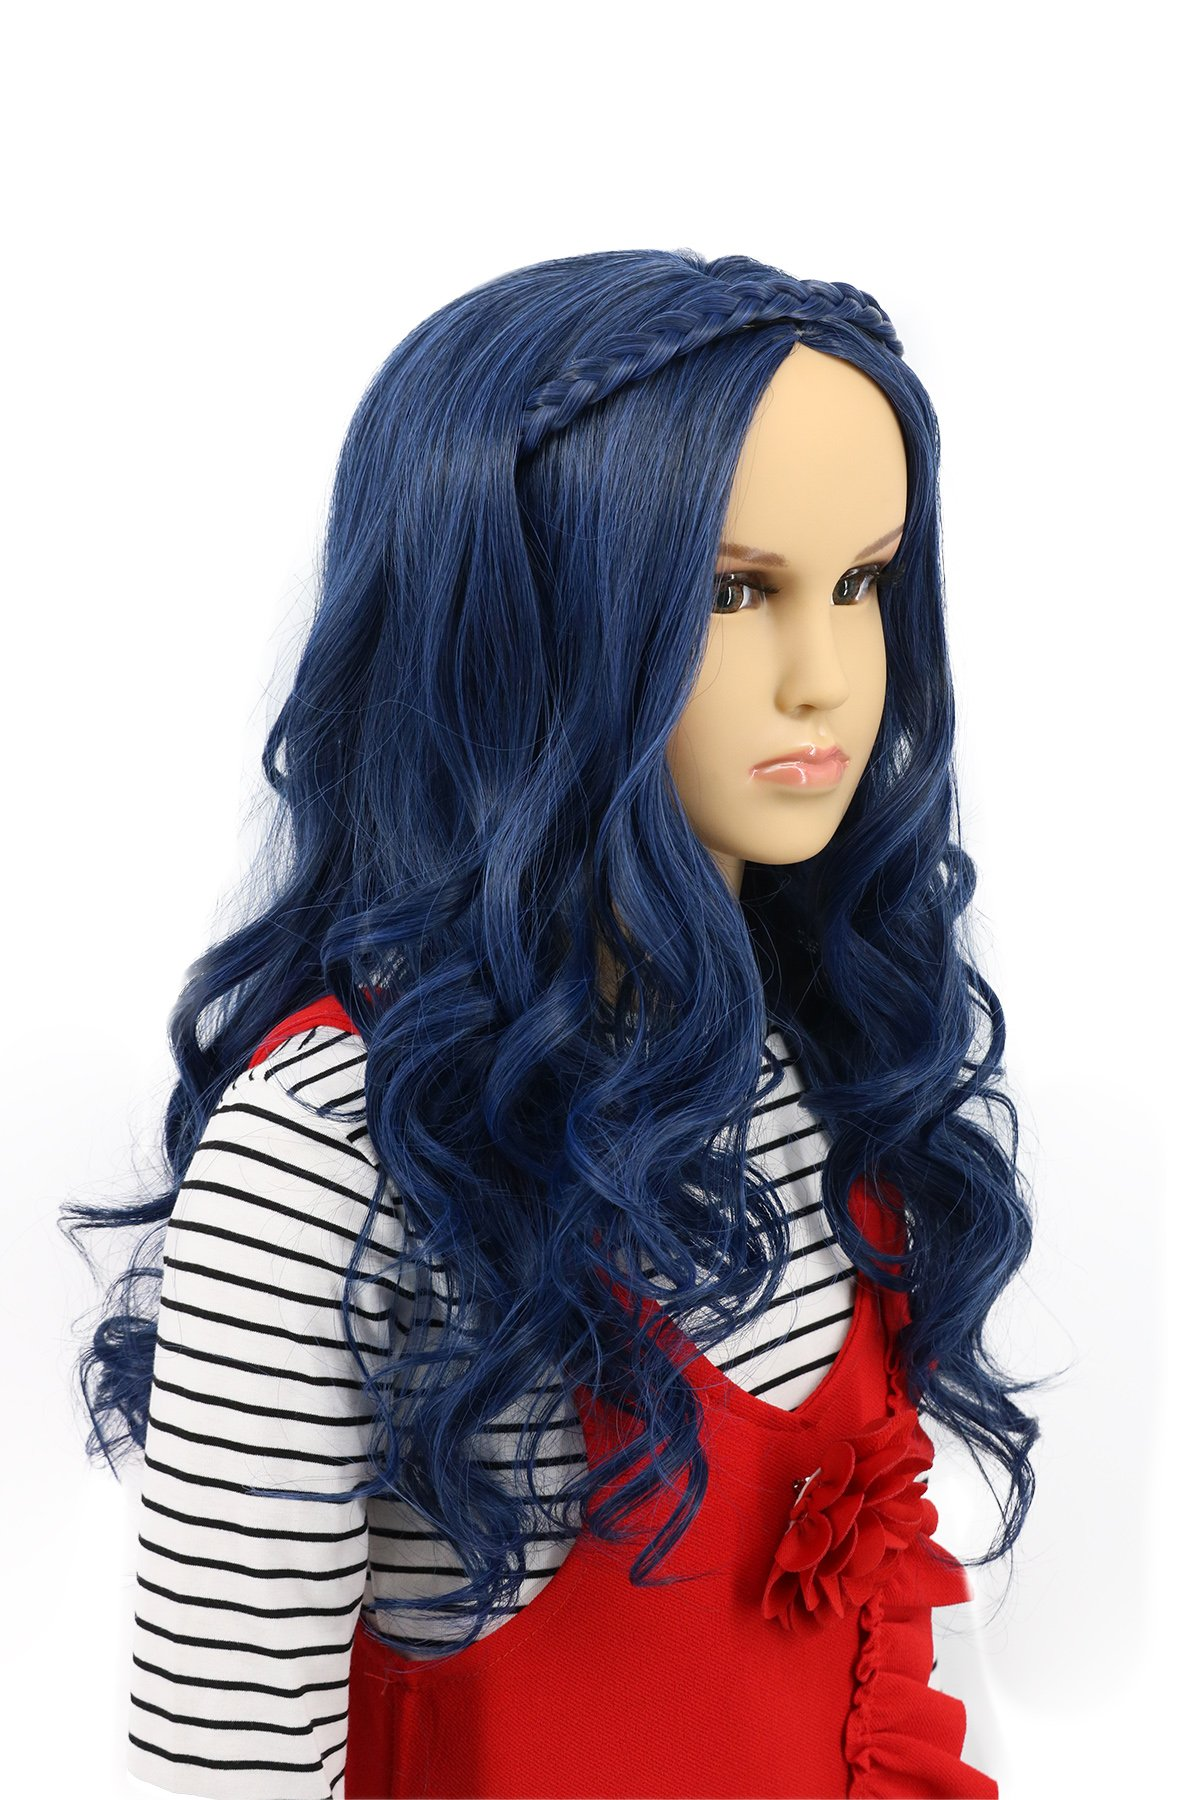 Karlery Child Kids Long Wave Blue Wig Halloween Cosplay Wig Anime Costume Party Wig by karlery